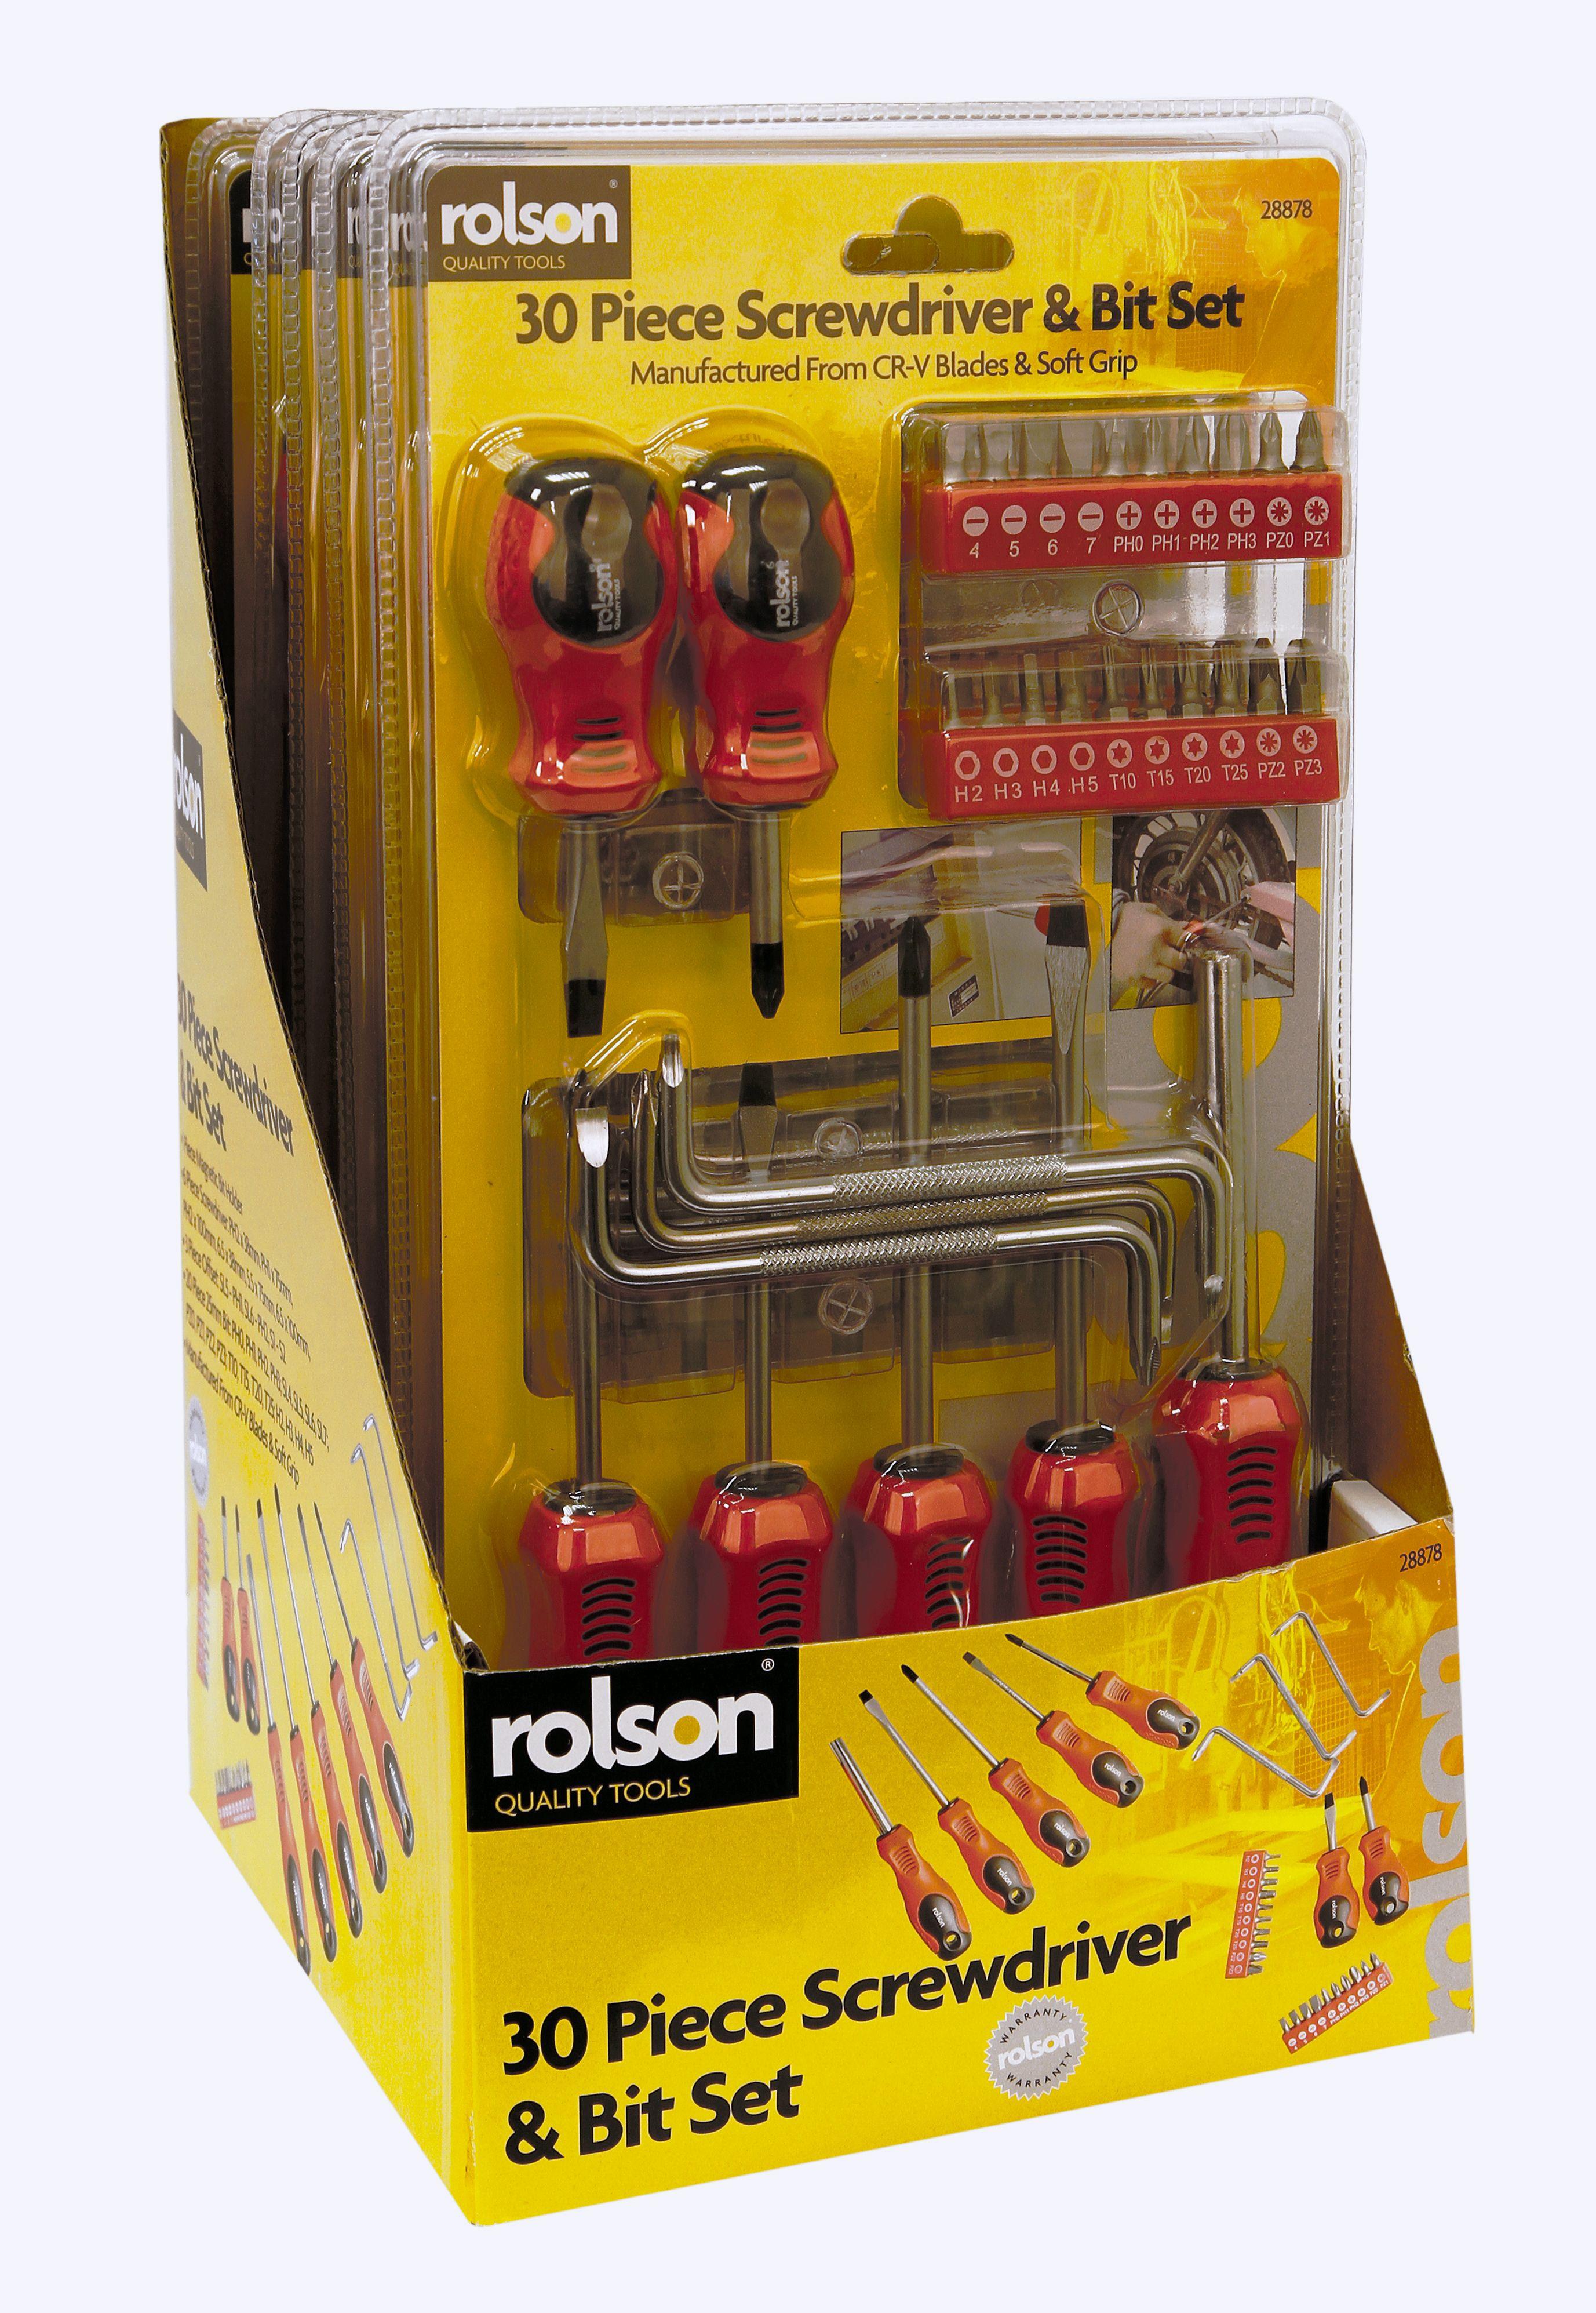 rolson stock no 28878 description 30pc screwdriver bit set manufactured with